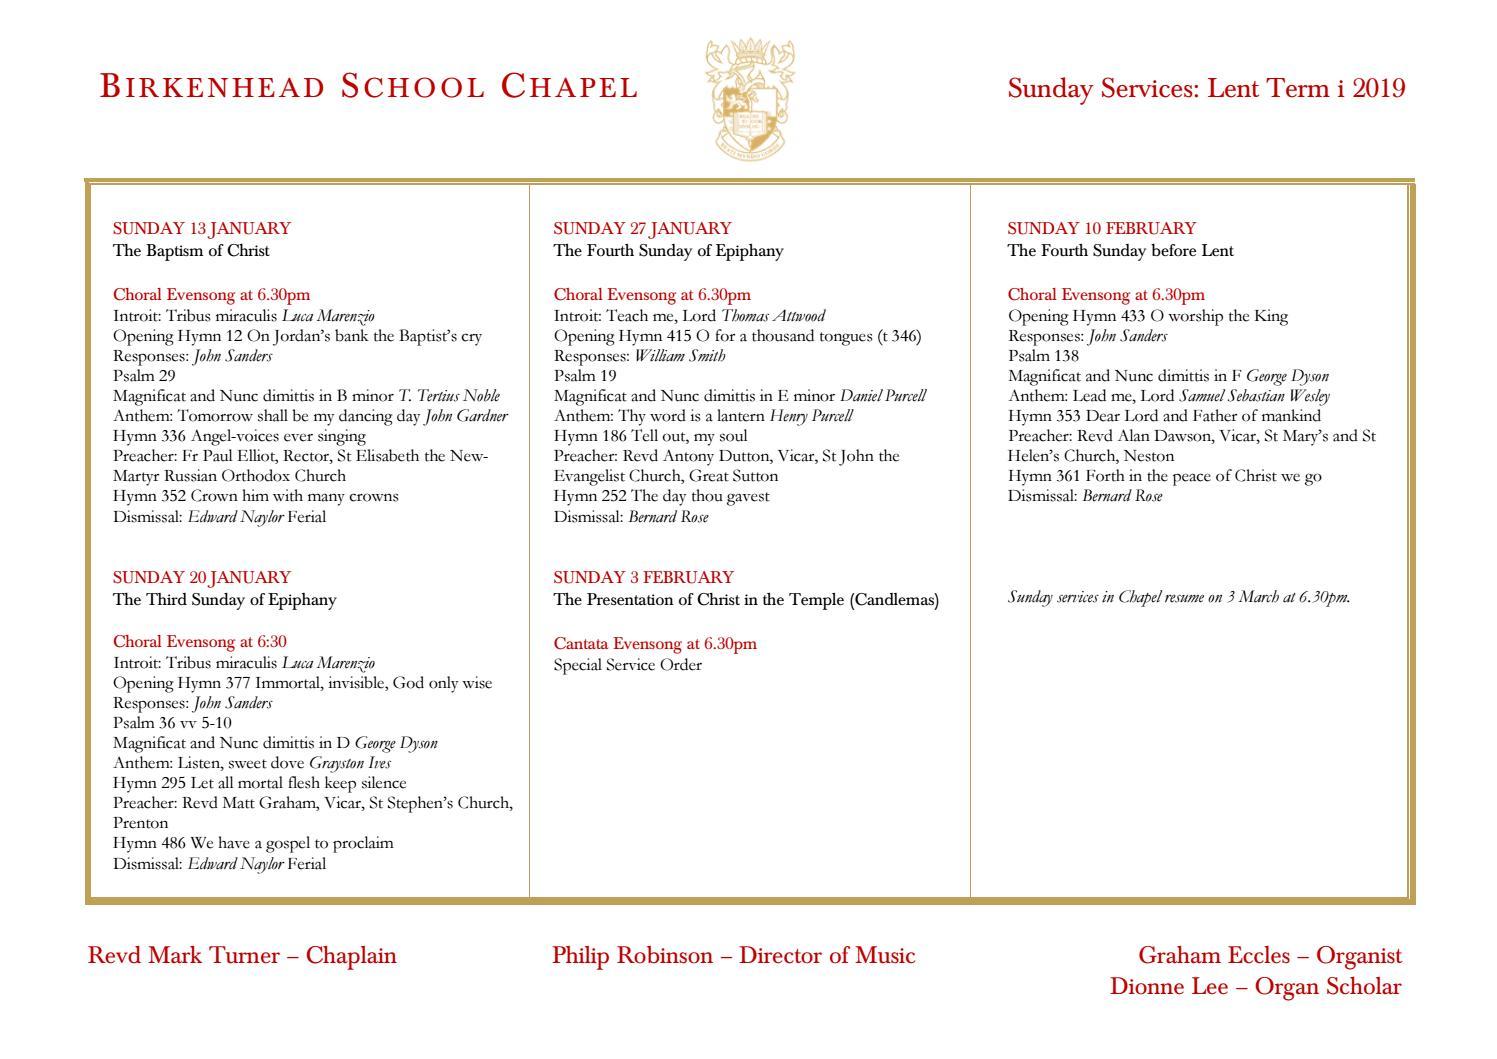 Birkenhead School Chapel: Evensong Services Lent Term 2019 by